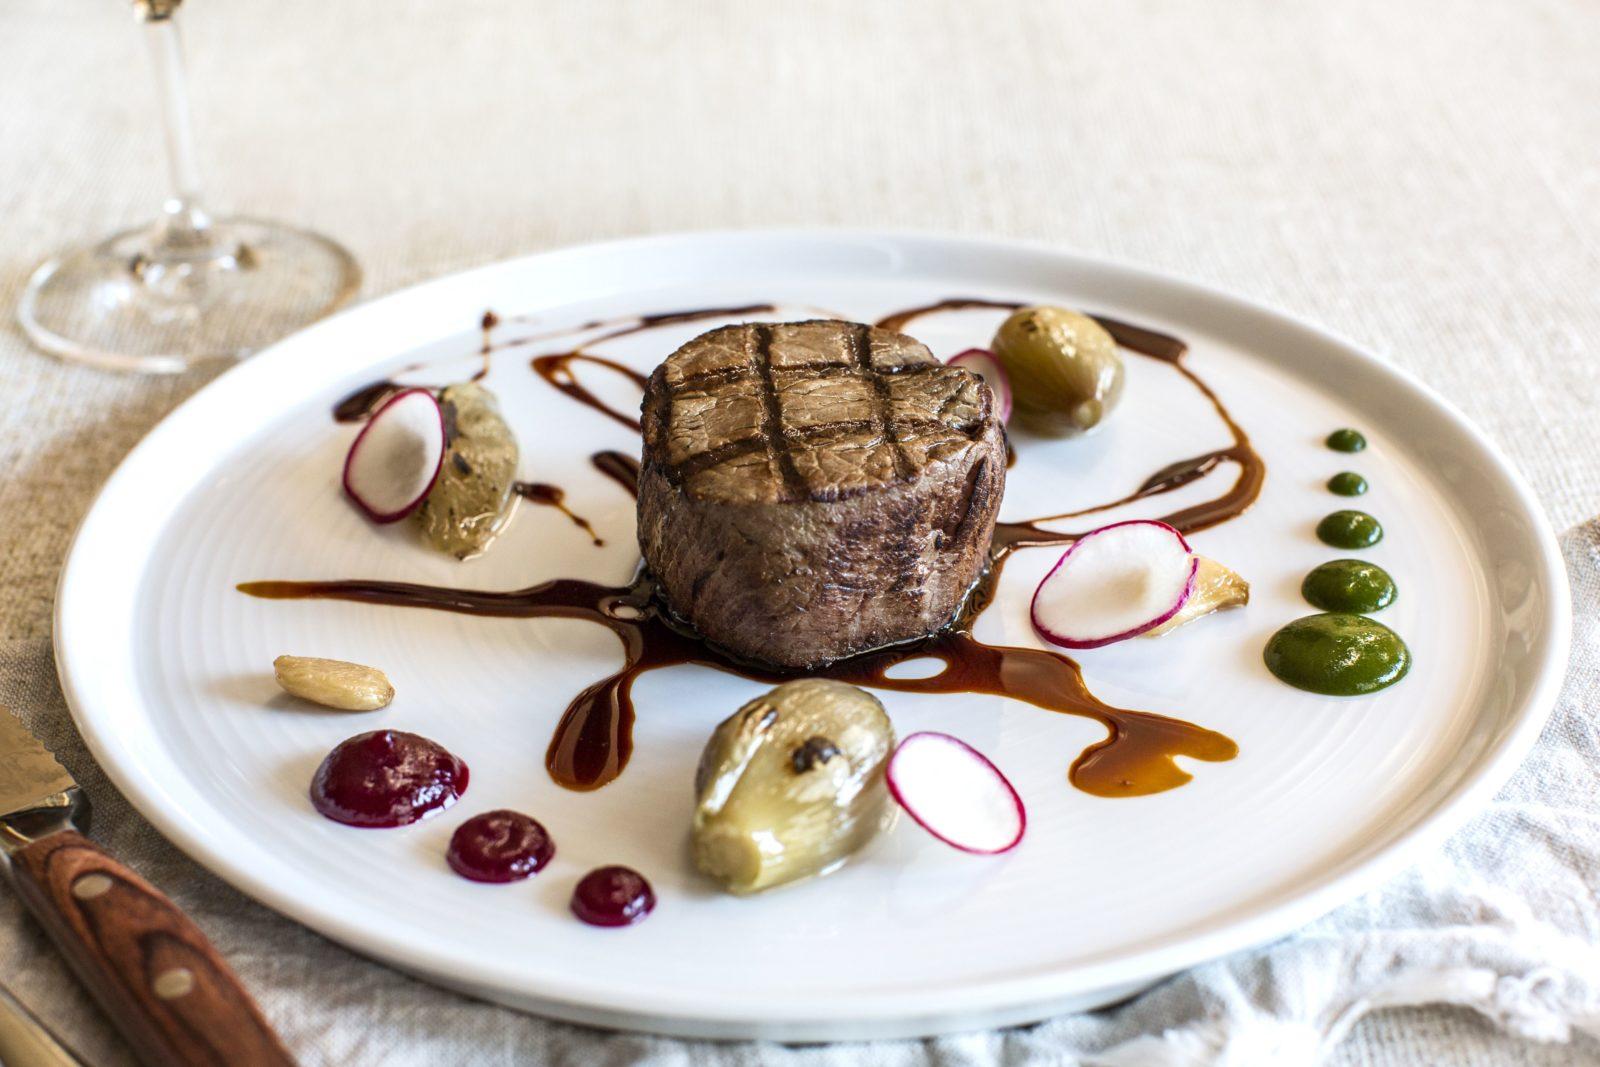 Steak dish at Helix